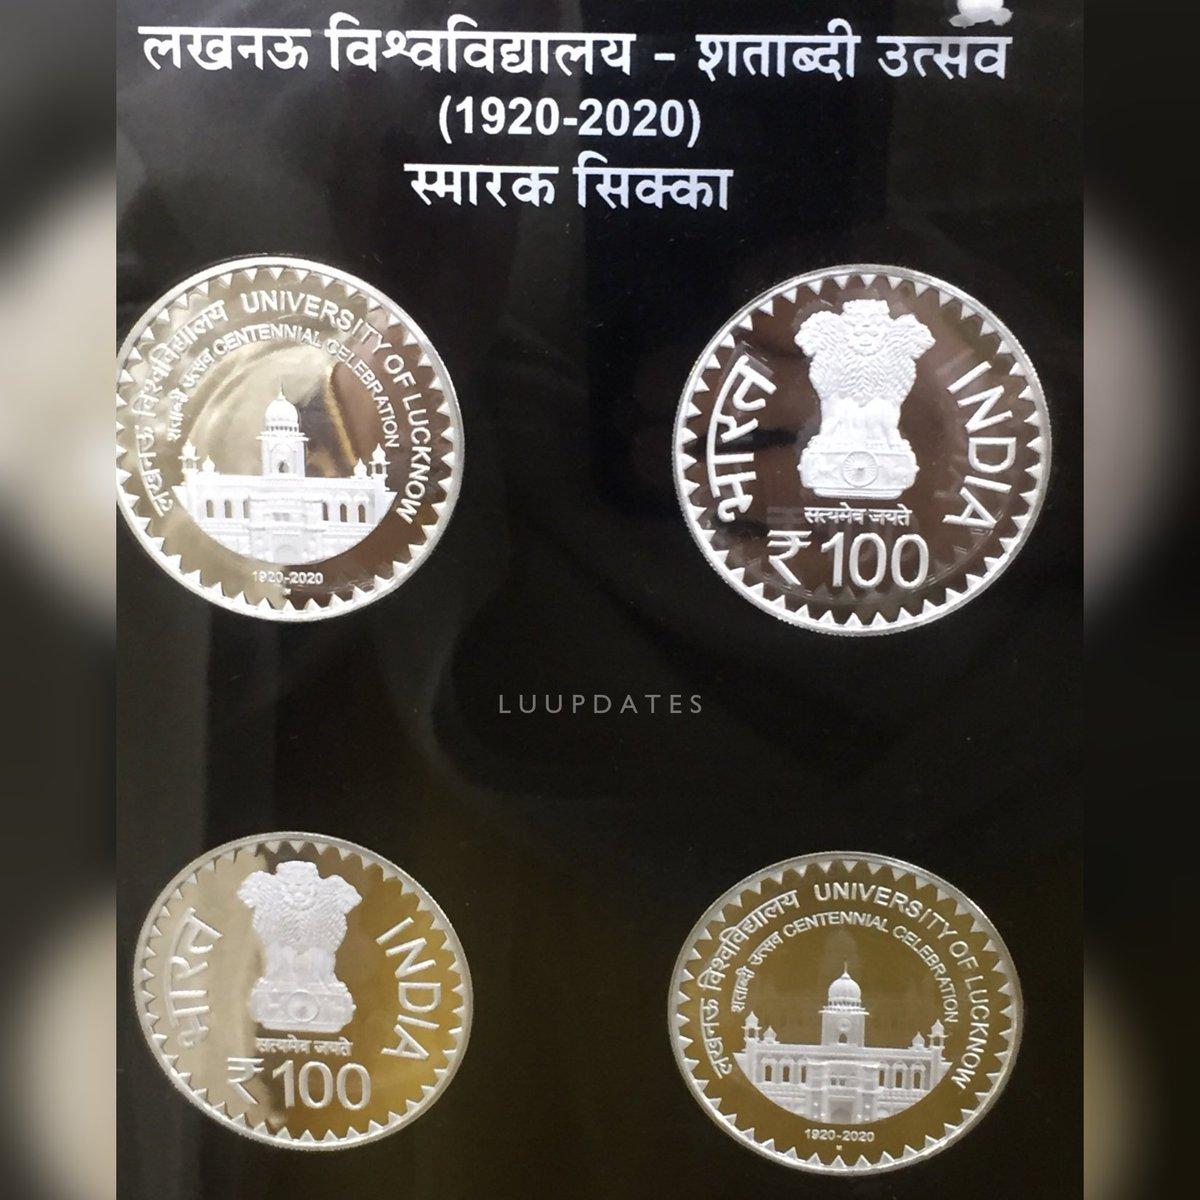 University 100 Years Coin... @lkouniv @CoELU4 @dswlkouniv @profalokkumar  .  ..  .  .  #luupdates #lucknowuniversity #UniversityOfLucknow #lucentennialcelebrations